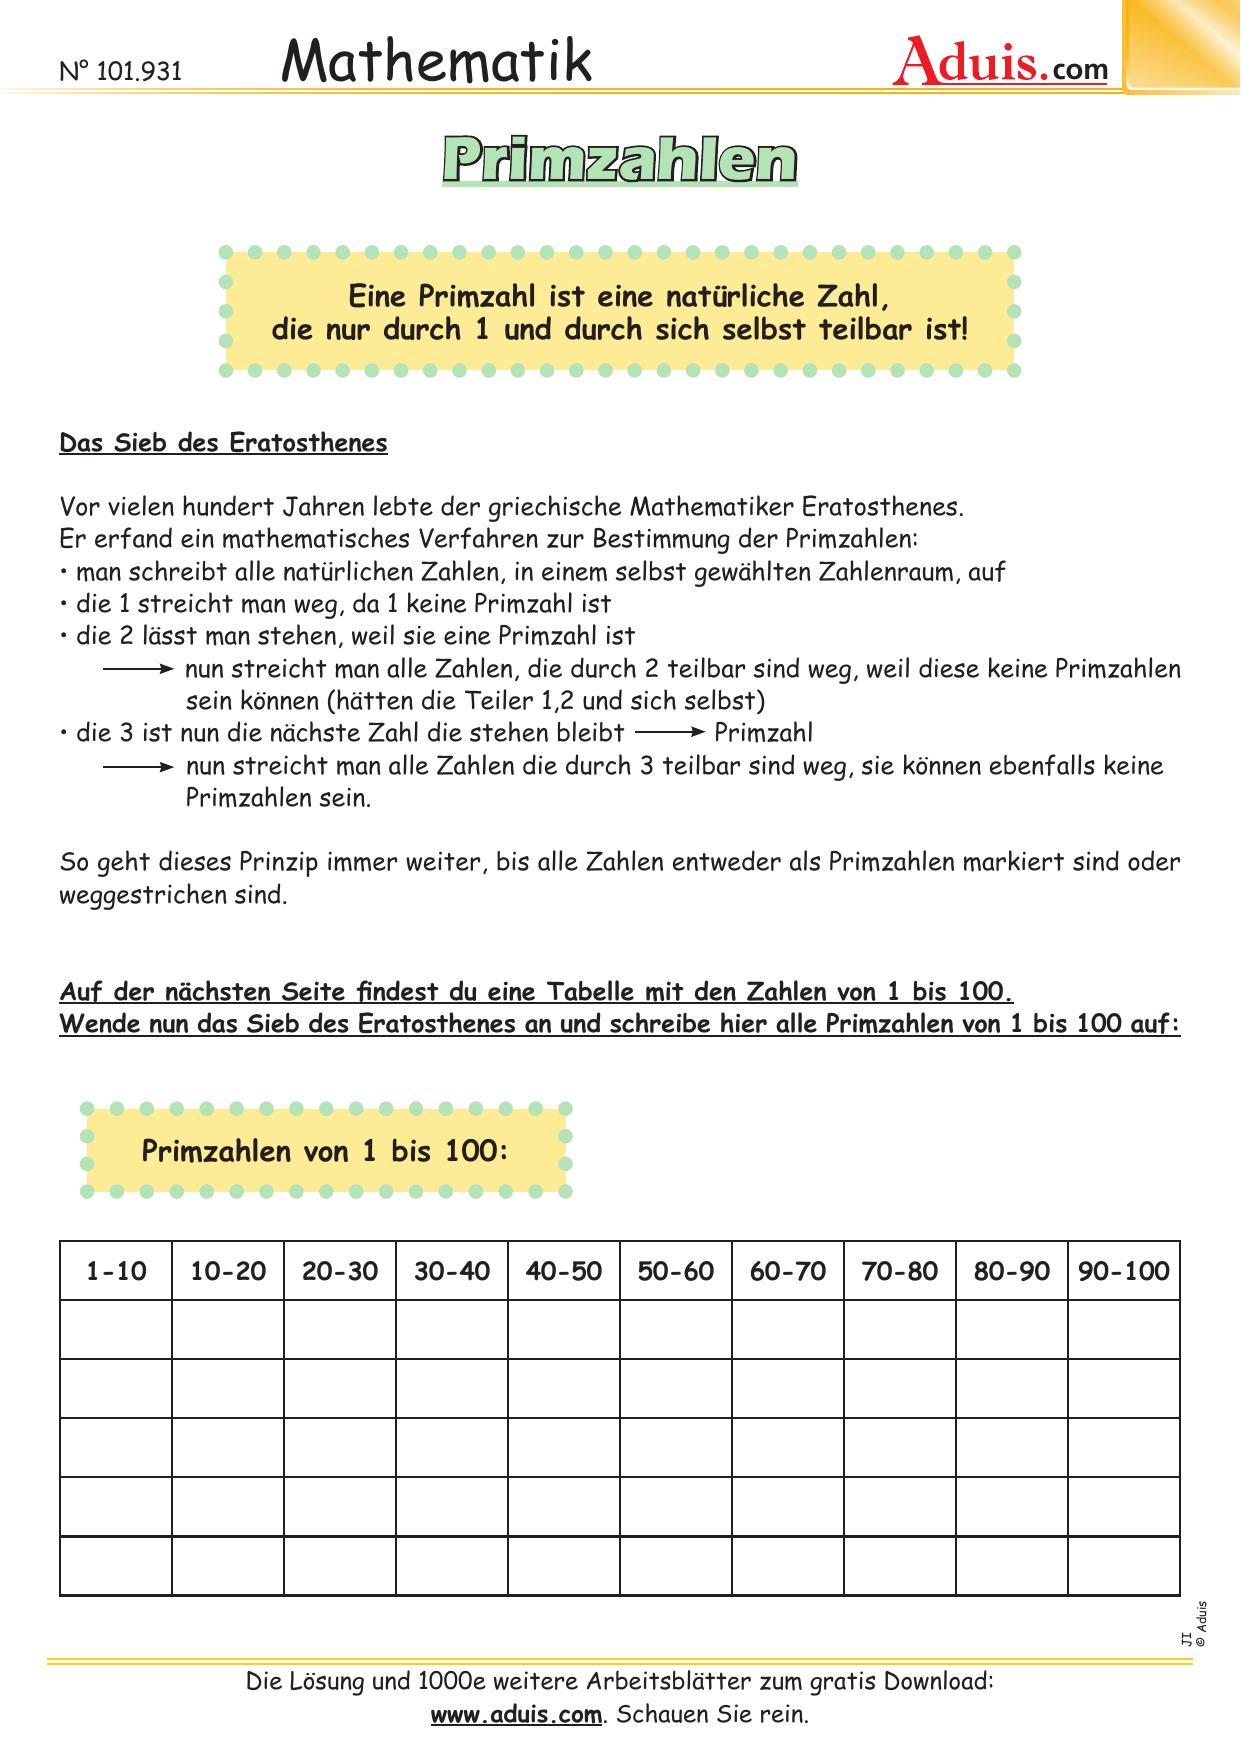 Großzügig Primzahlen Arbeitsblatt Fotos - Super Lehrer ...